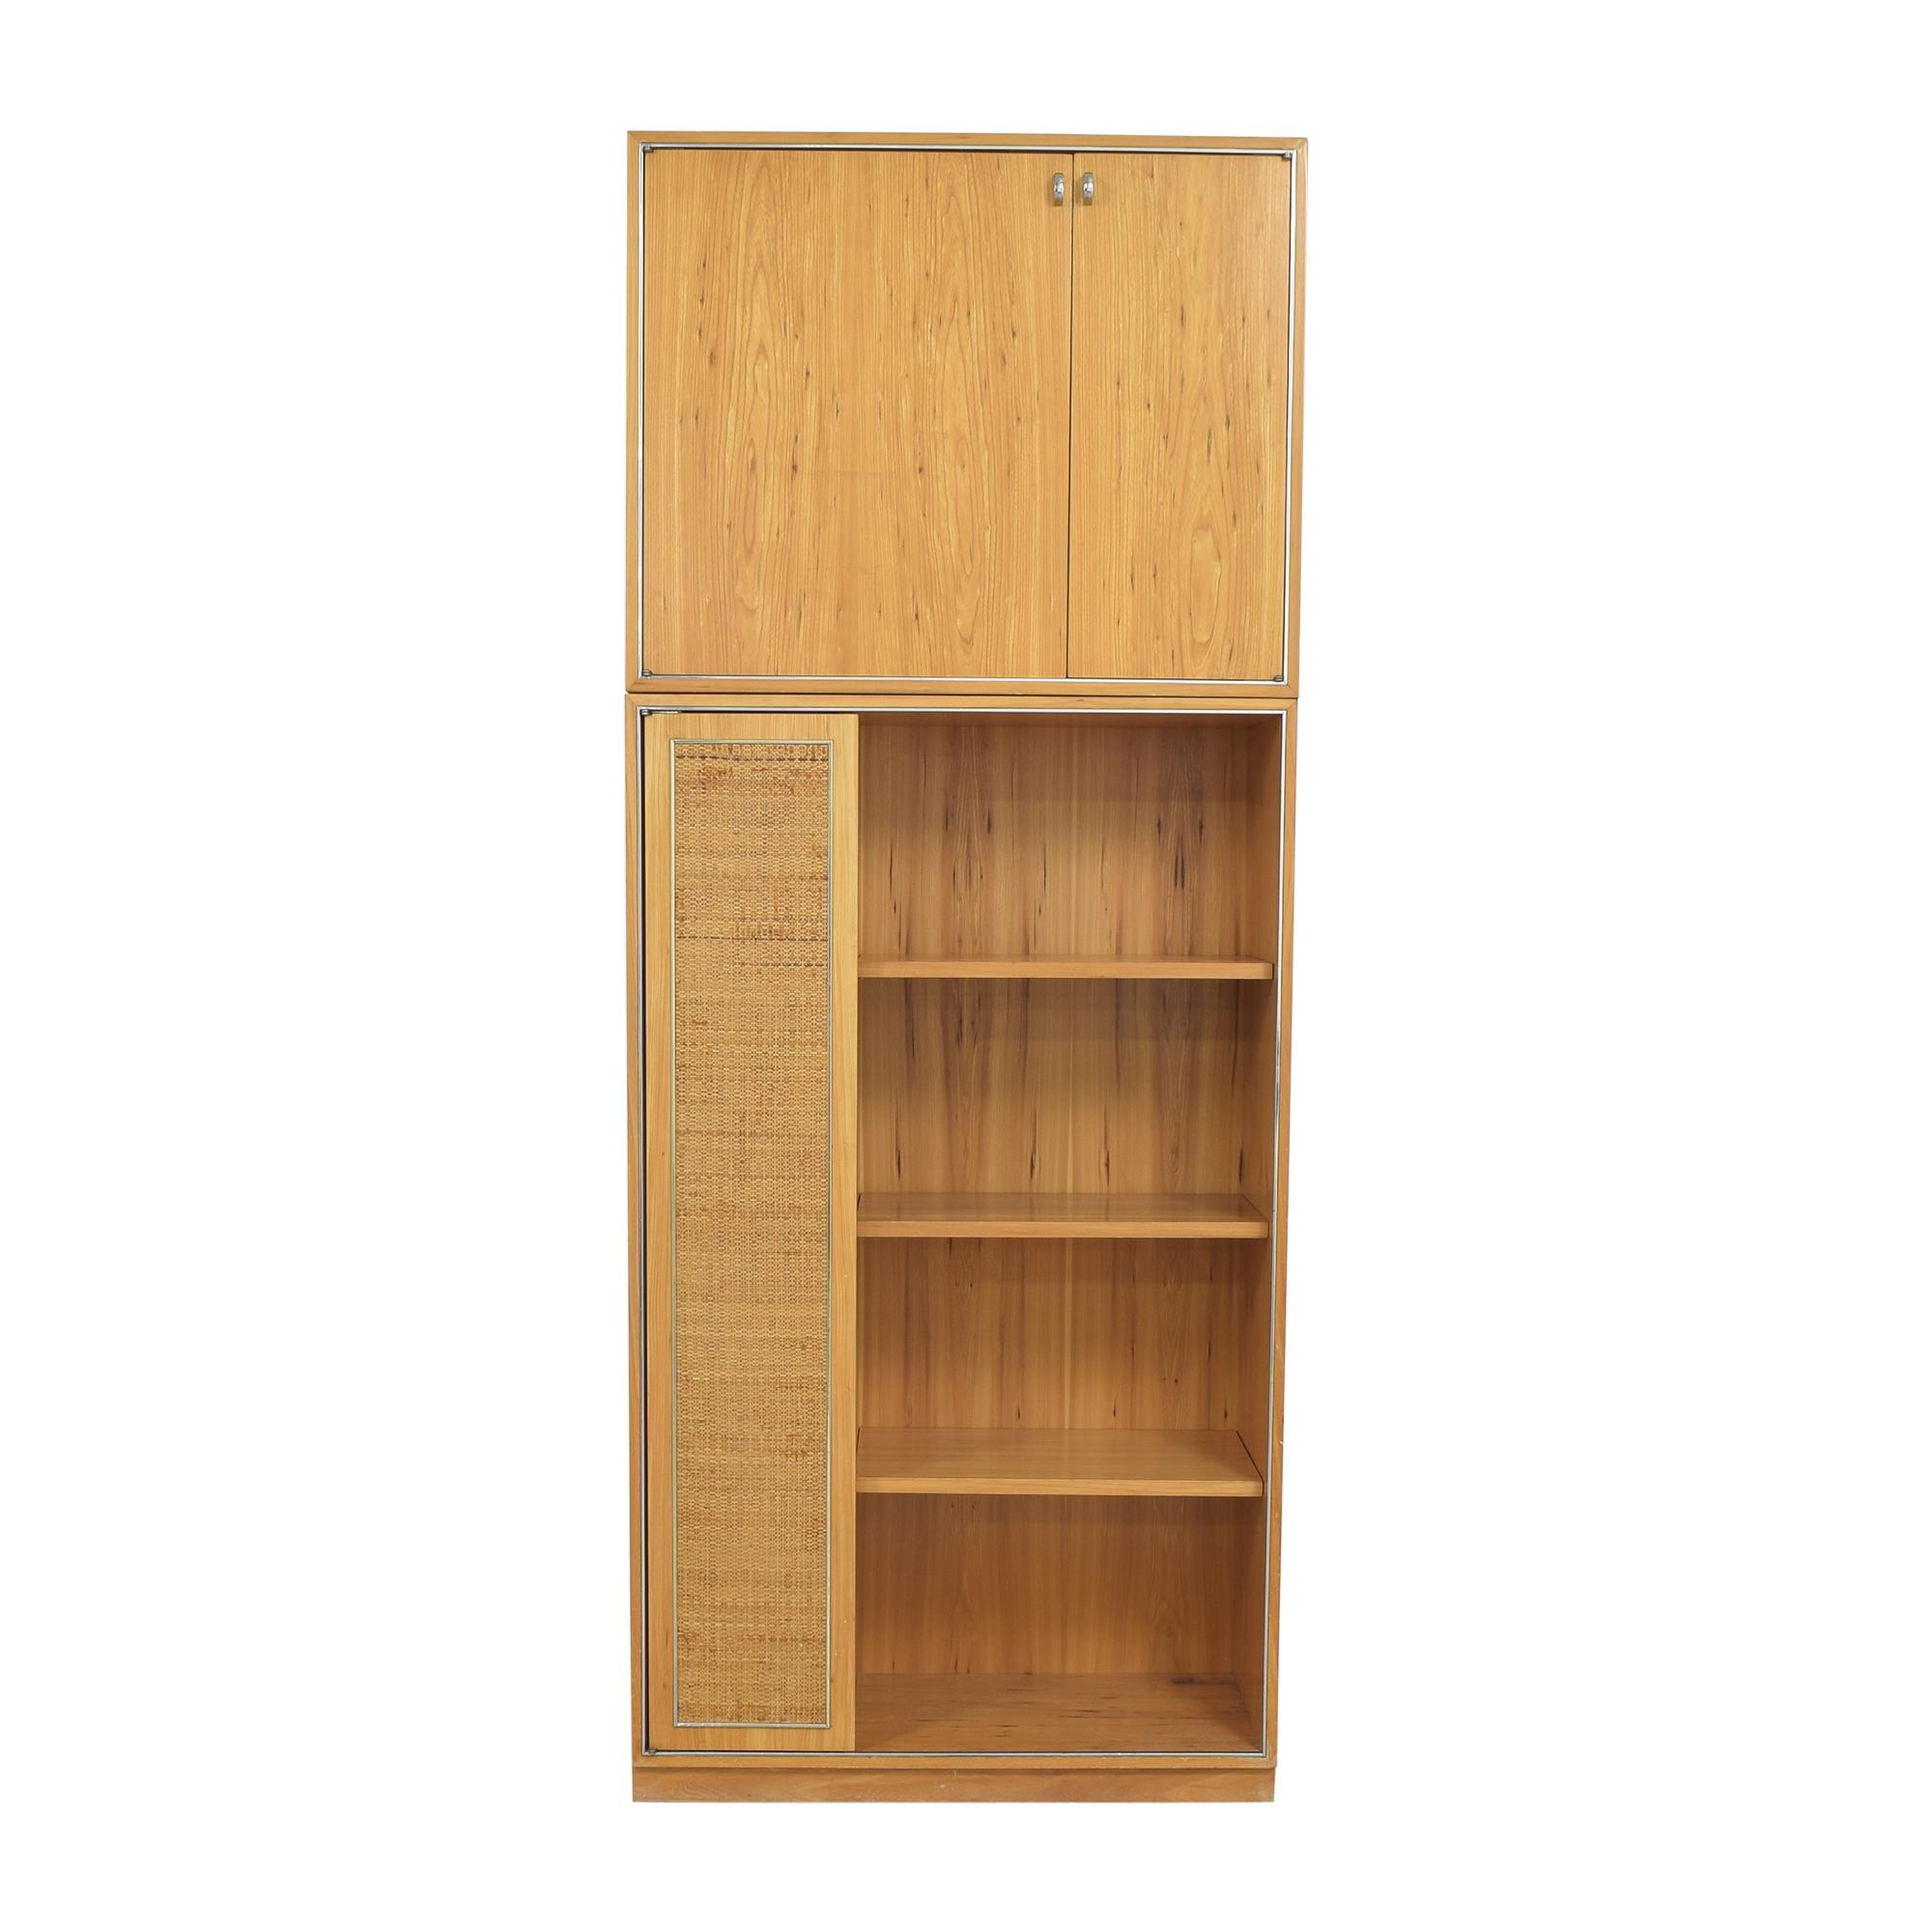 John Stuart Inc. Wooden Bedroom Unit sale